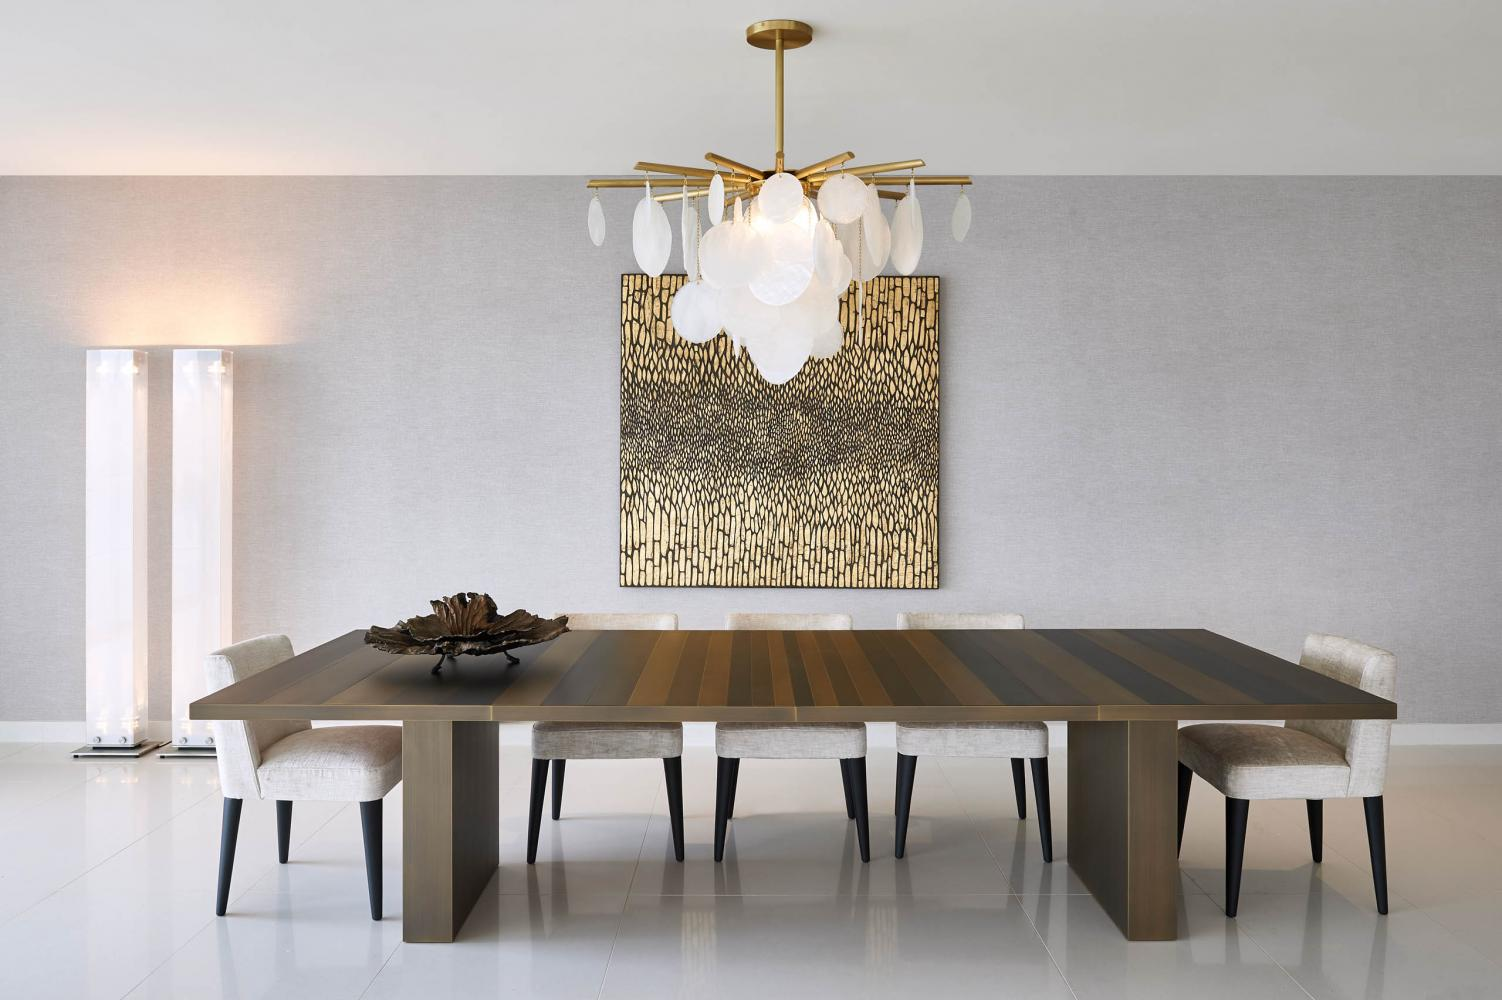 Luxury modern table clad in metal for dining room Laurameroni in Dubai Serenia Residences by Caspaiou Interior Design